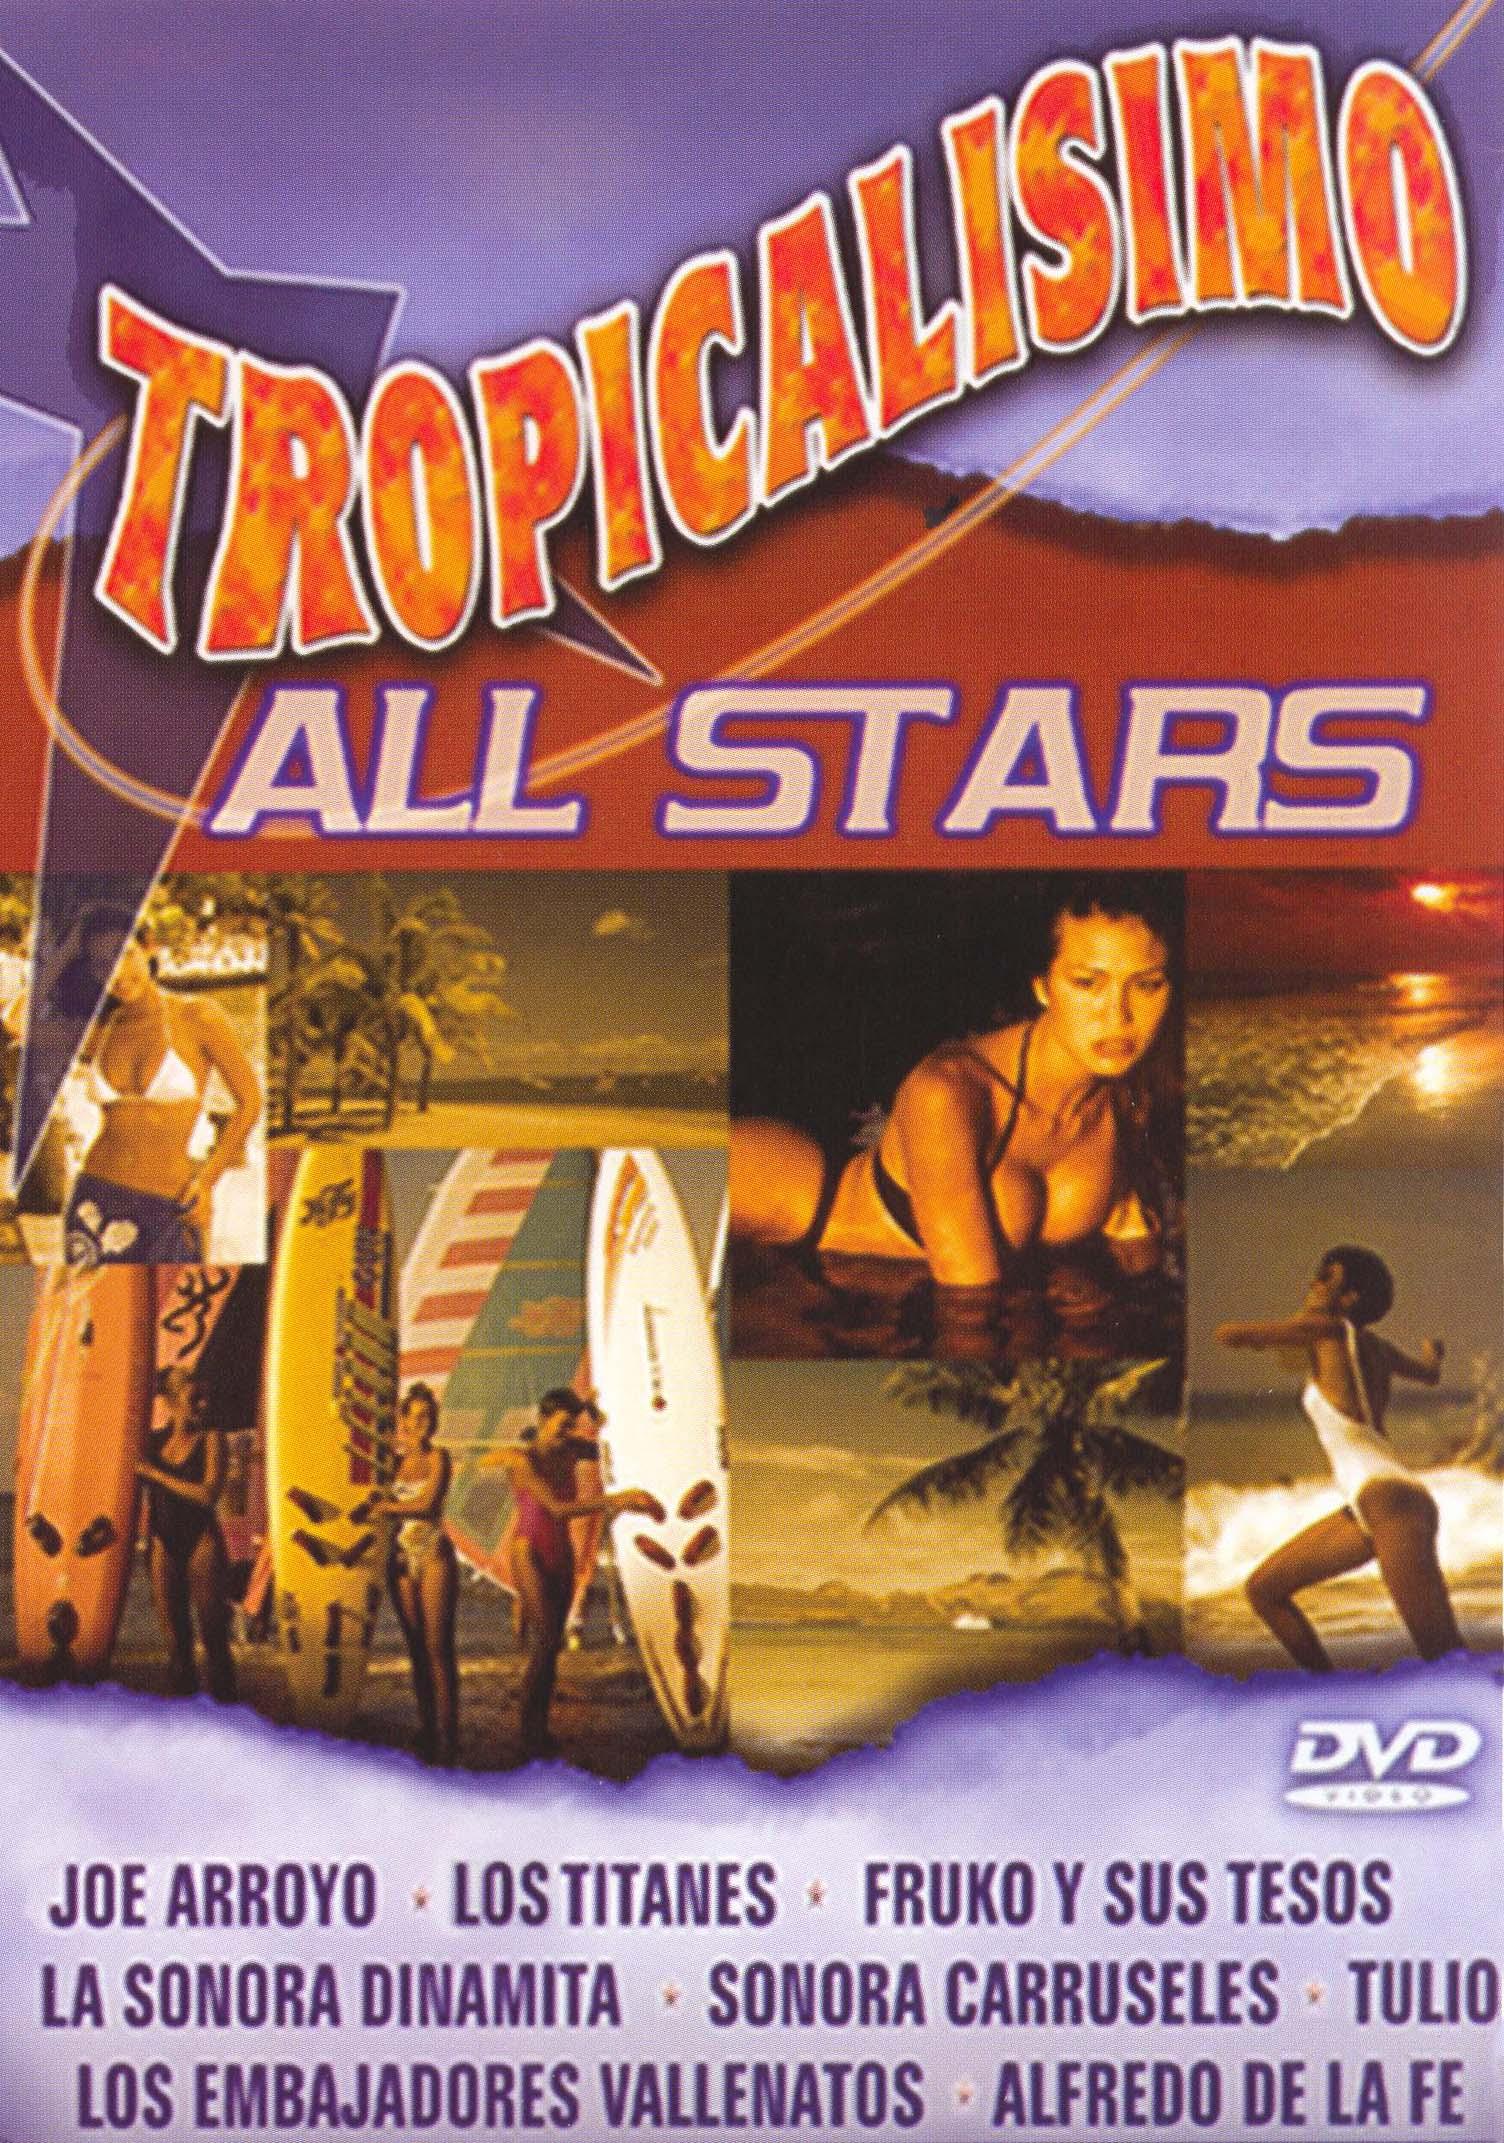 Tropicalisimo All Stars